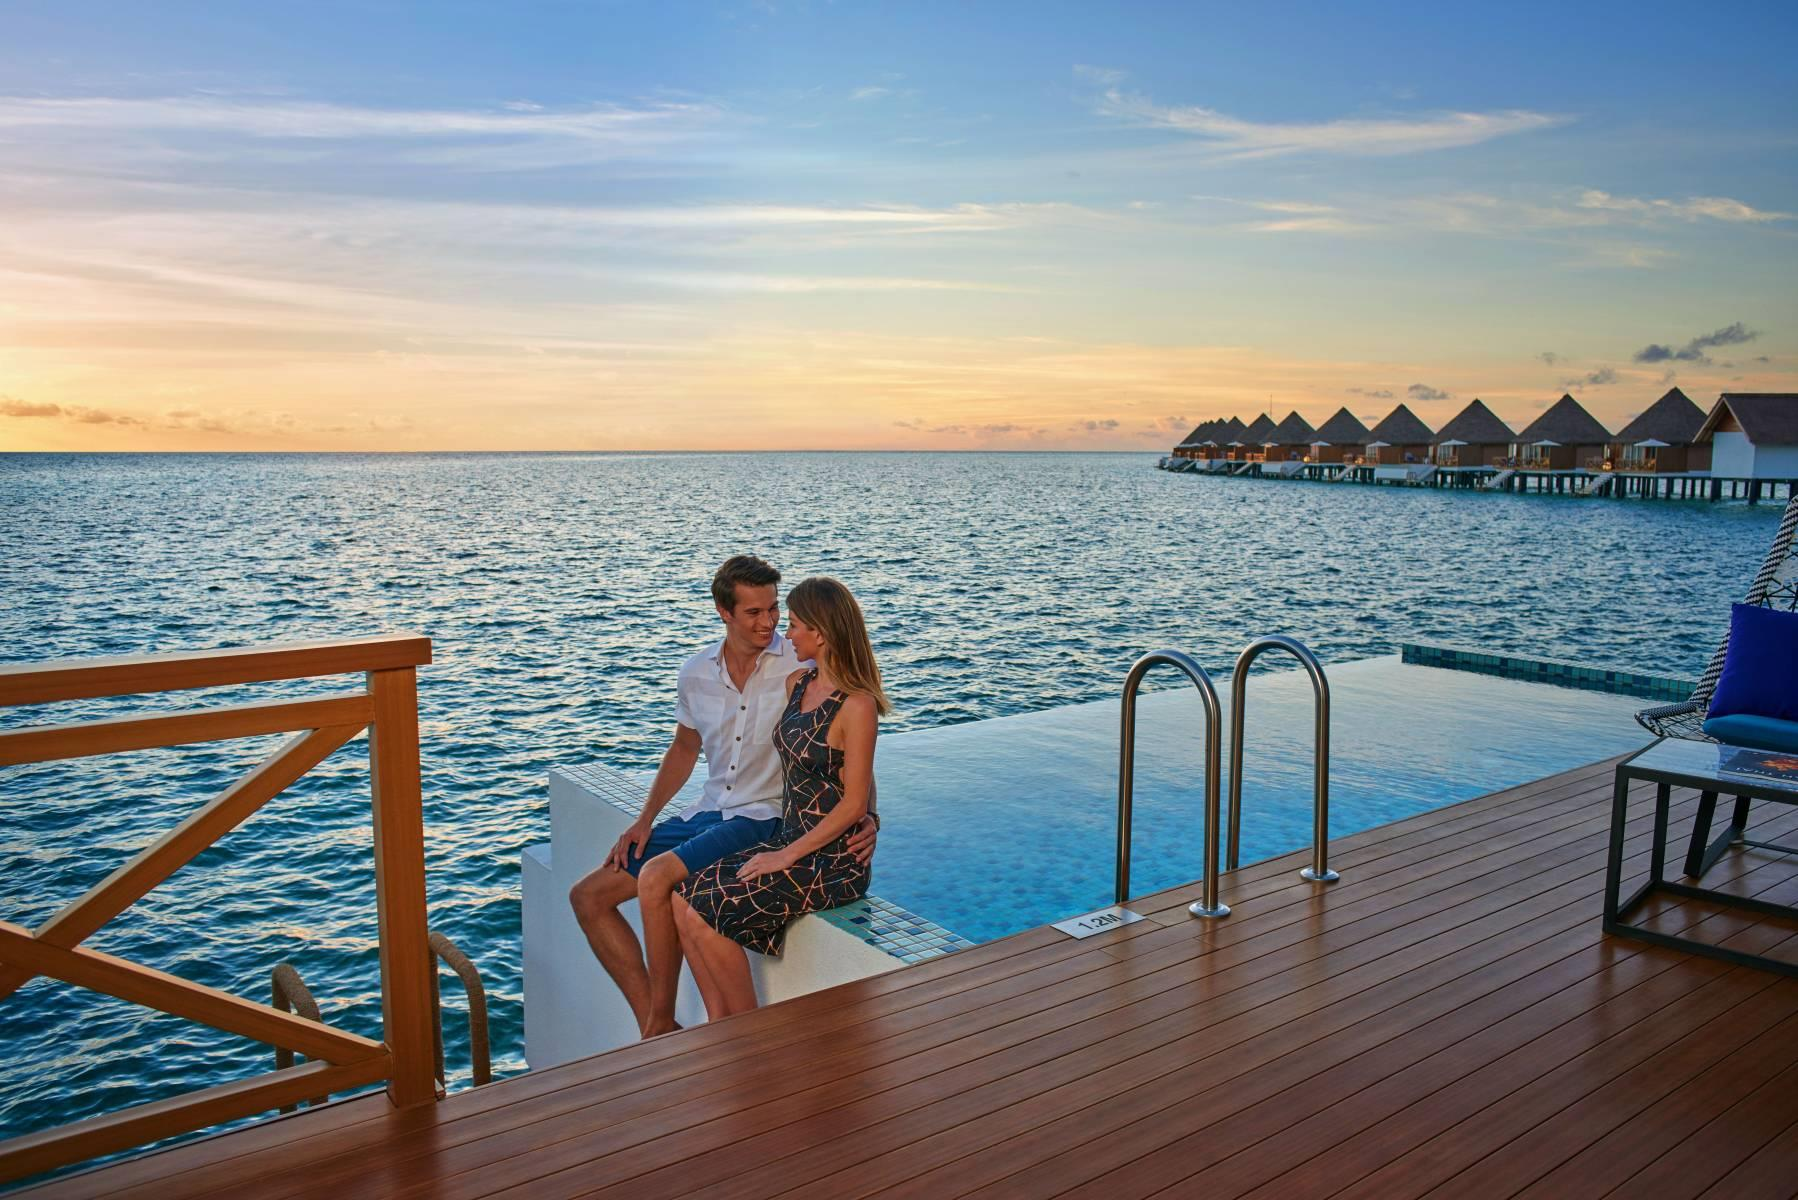 mercure-maldives-kooddoo-resort-genel-008